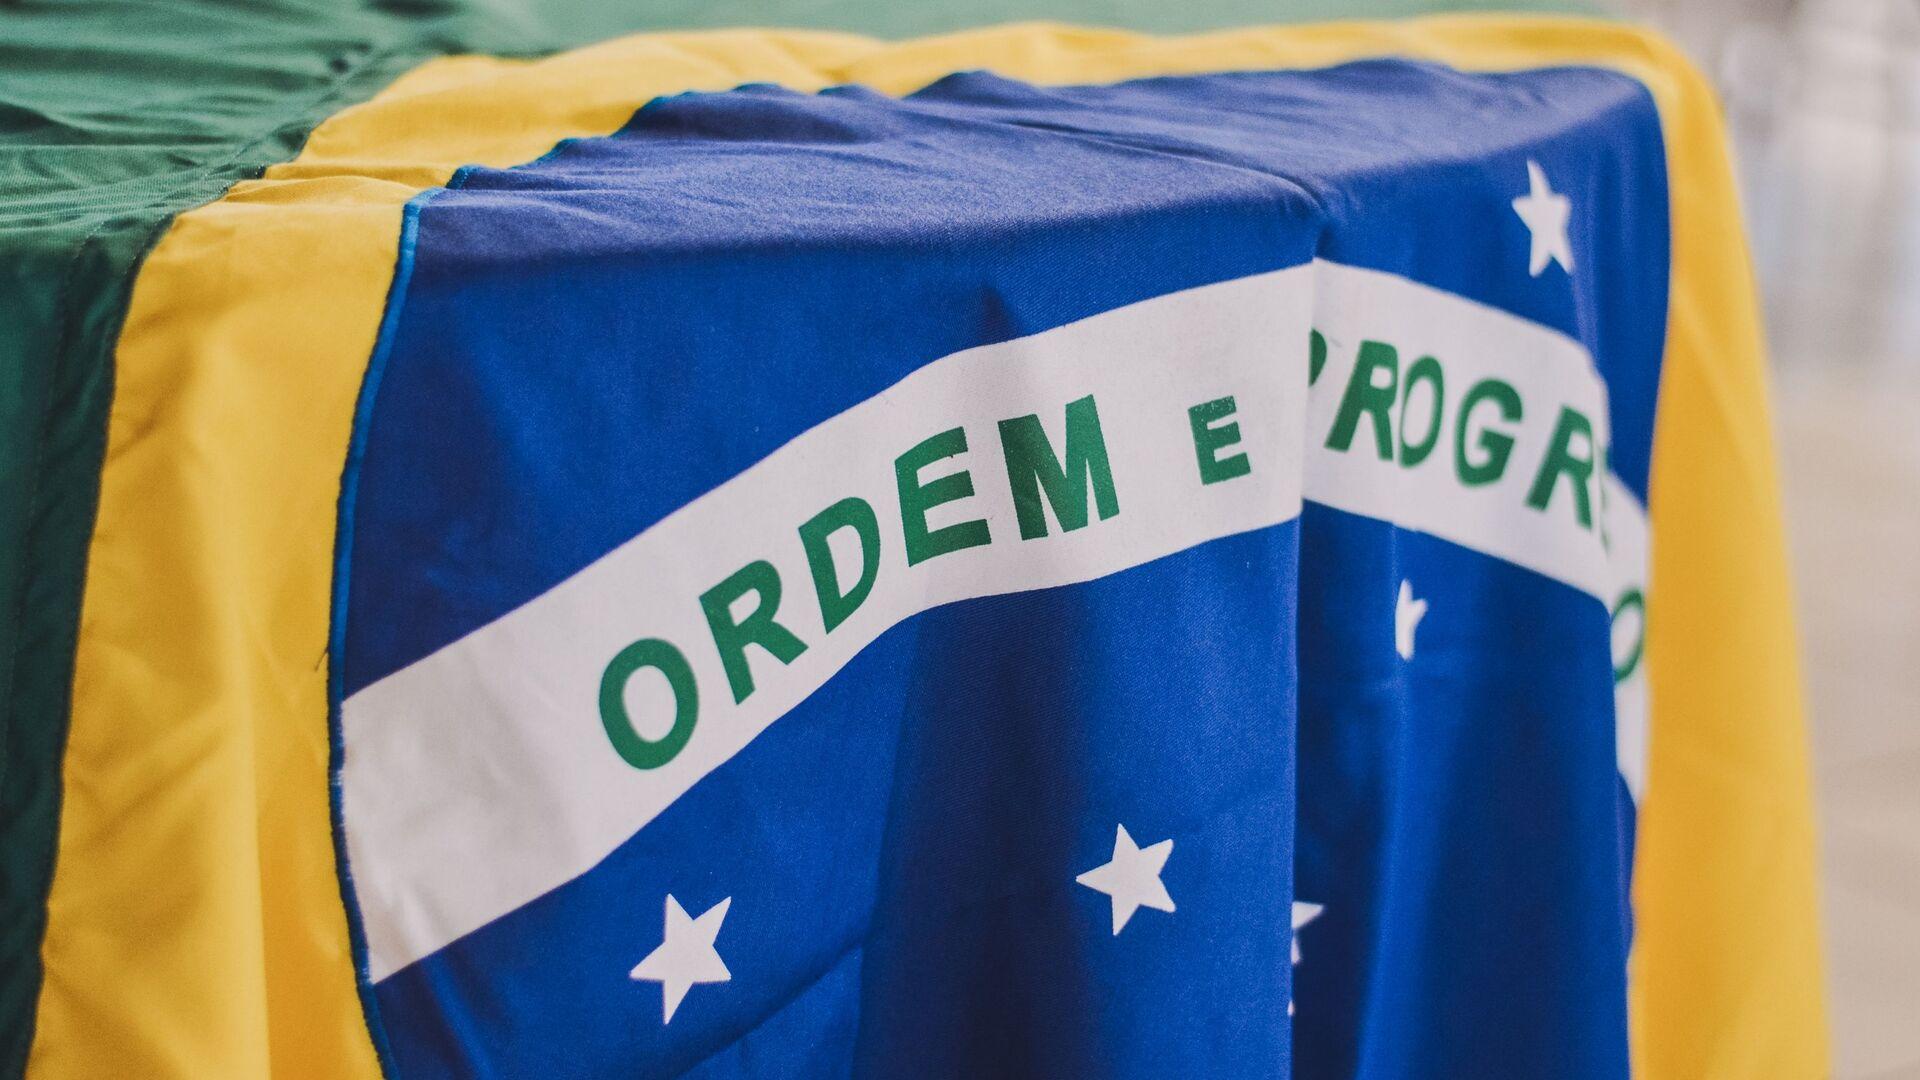 La bandera de Brasil - Sputnik Mundo, 1920, 10.07.2021